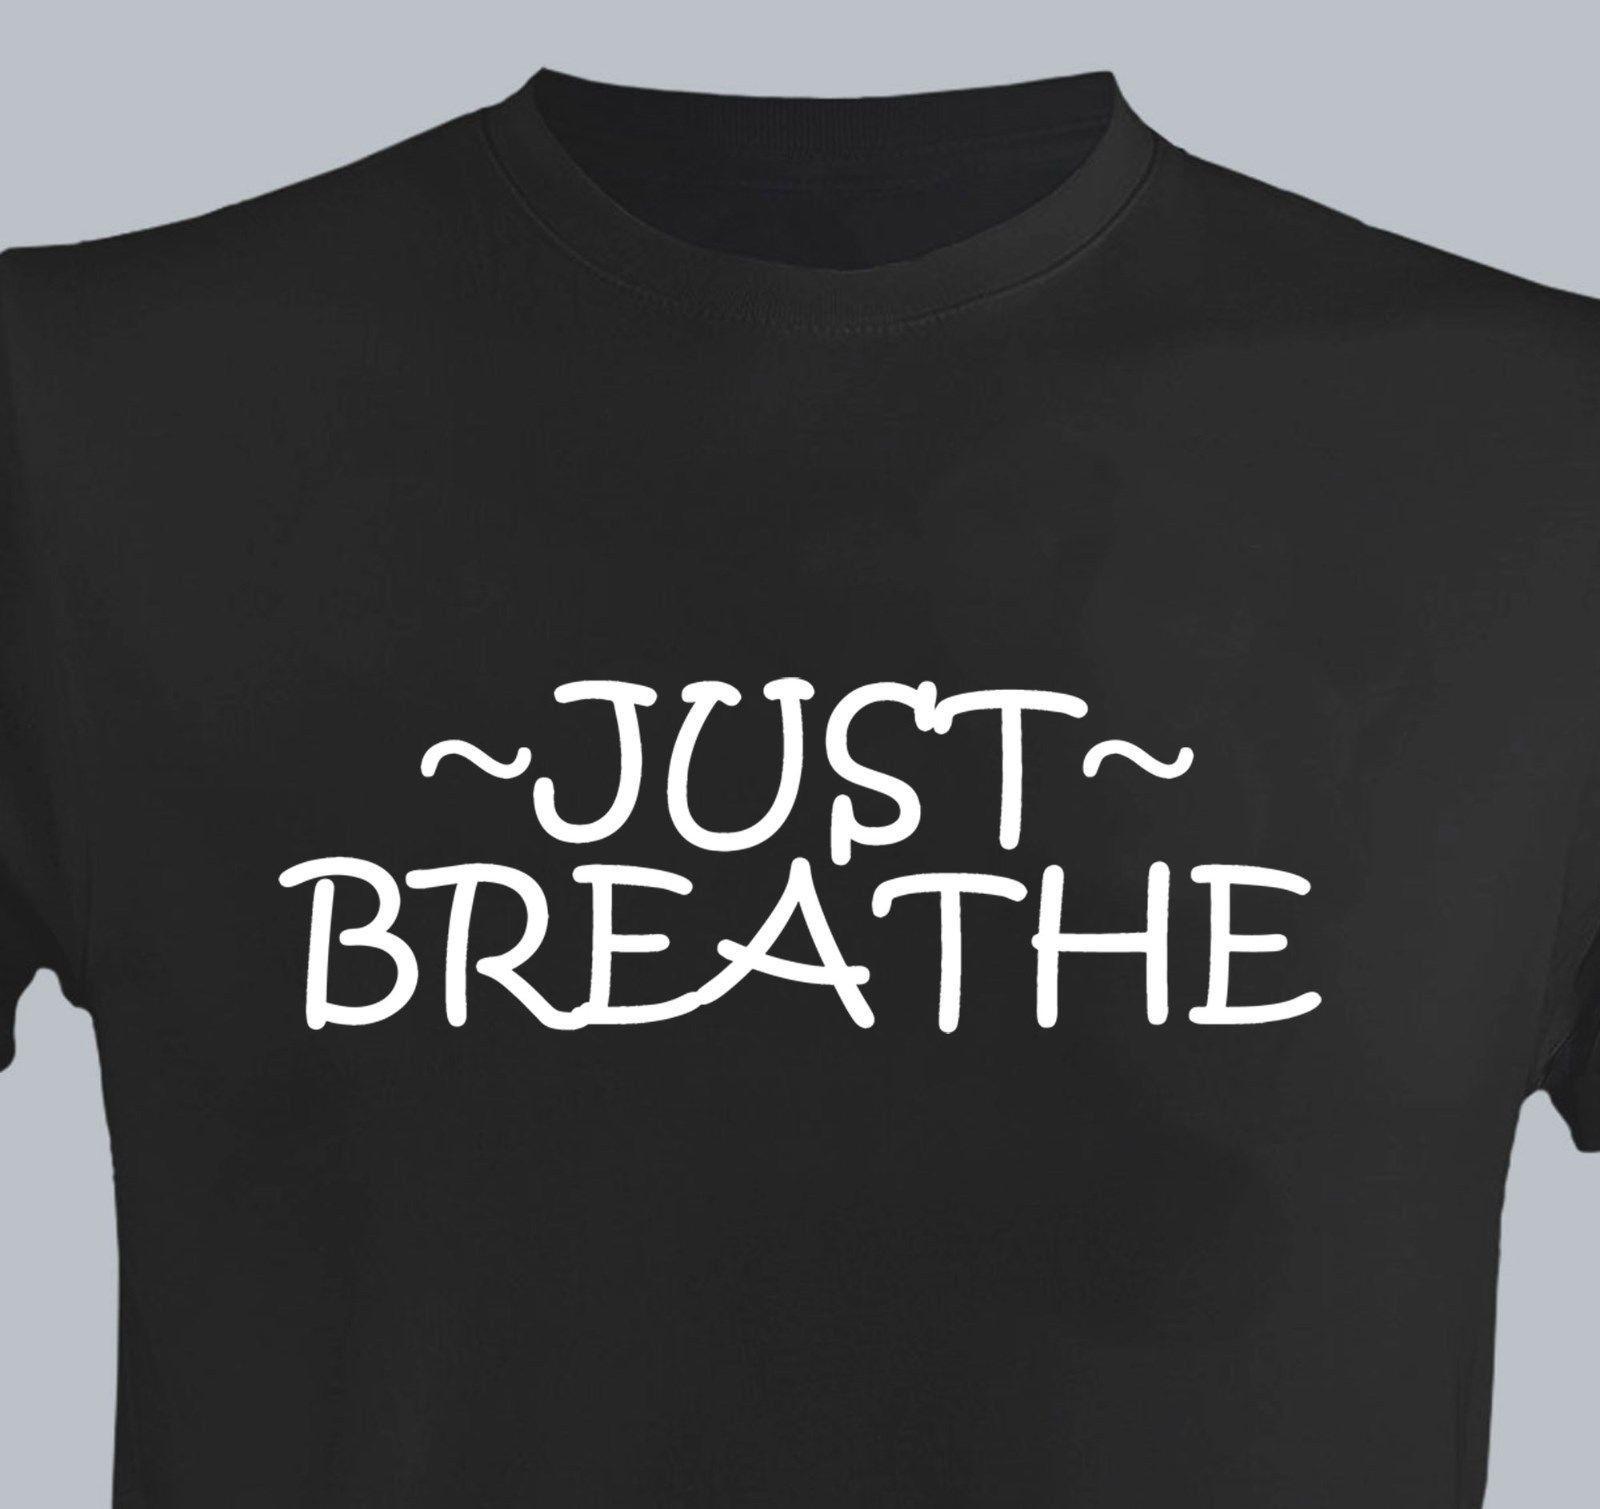 image about Printable Tshirt Vinyl named Accurately Breathe Guys Fresh T-blouse VINYL Print Determination Slogan Fitness center Exercise routine Relaxed white black gray purple pants tshirt